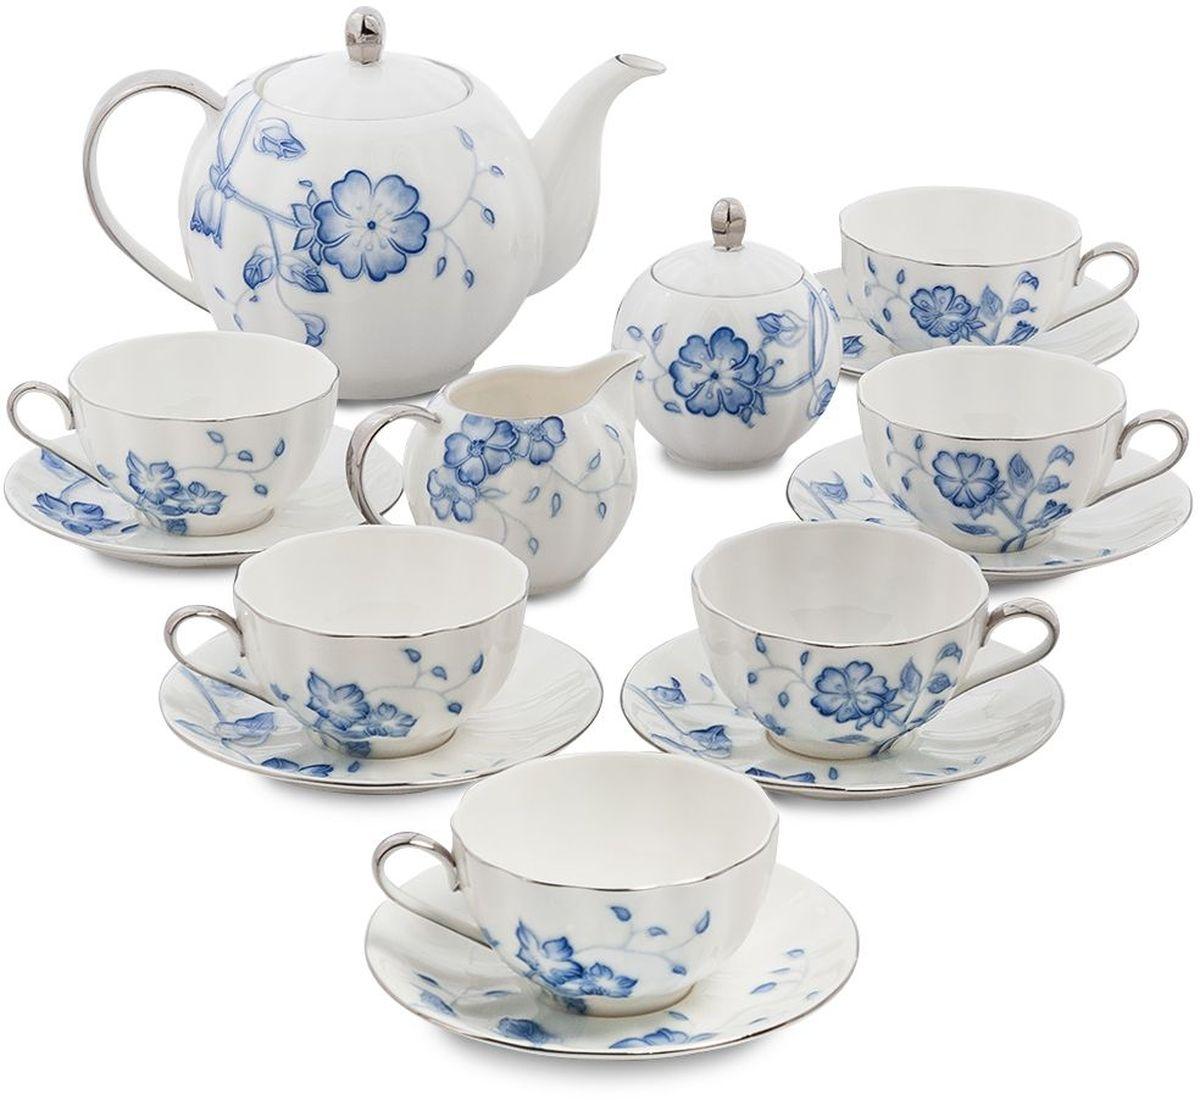 Сервиз чайный Pavone Голубая бабочка, 15 предметов. 451601FS-91909Объем чайника: 1 лОбъем сахарницы: 200 мл Объем молочника: 200 мл Объем чашки: 200 млДиаметр блюдца: 14 см.